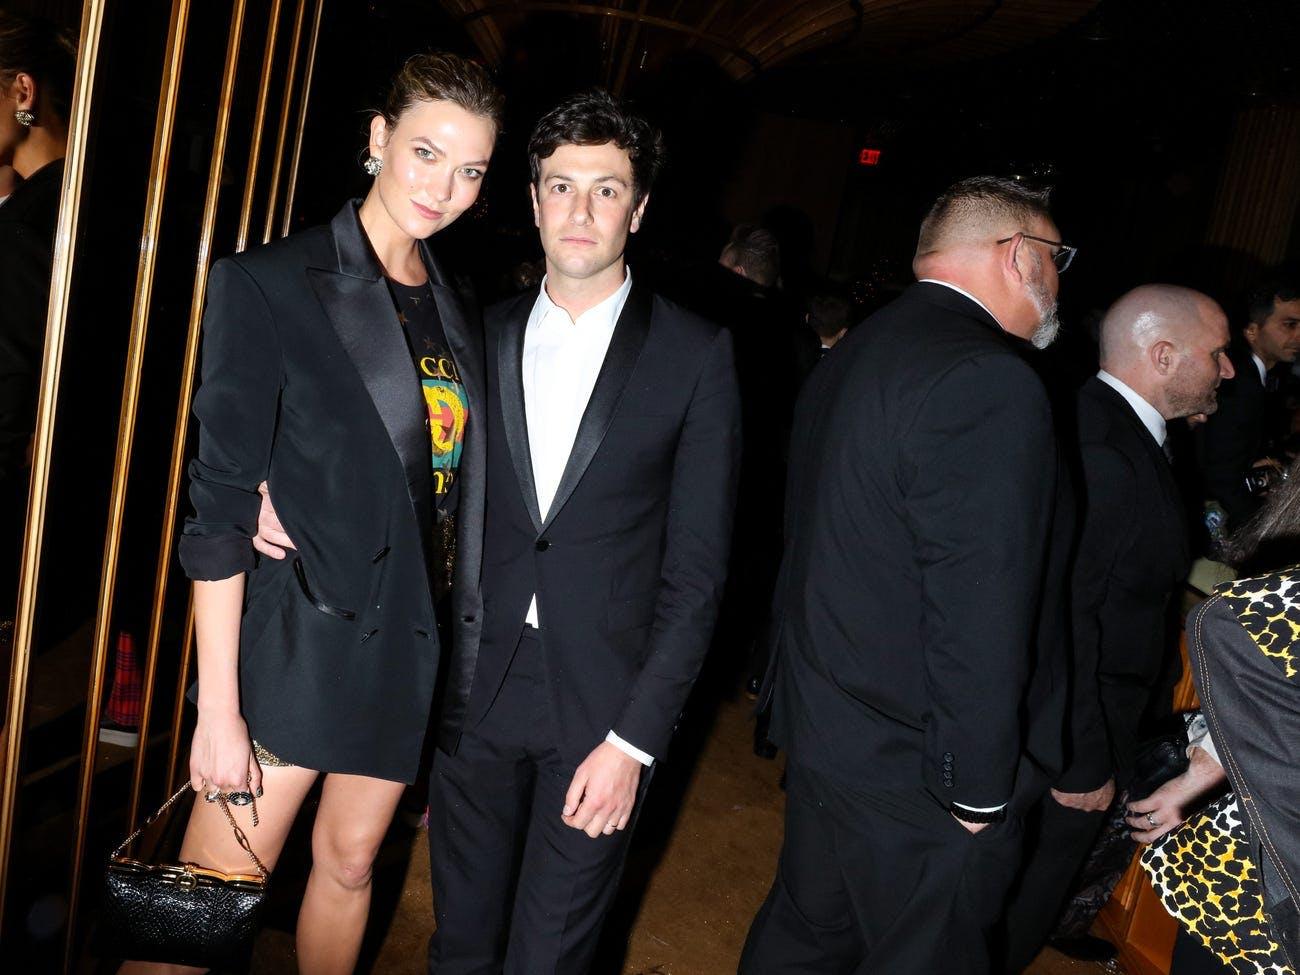 Karlie Kloss and Jared Kushner At An Event